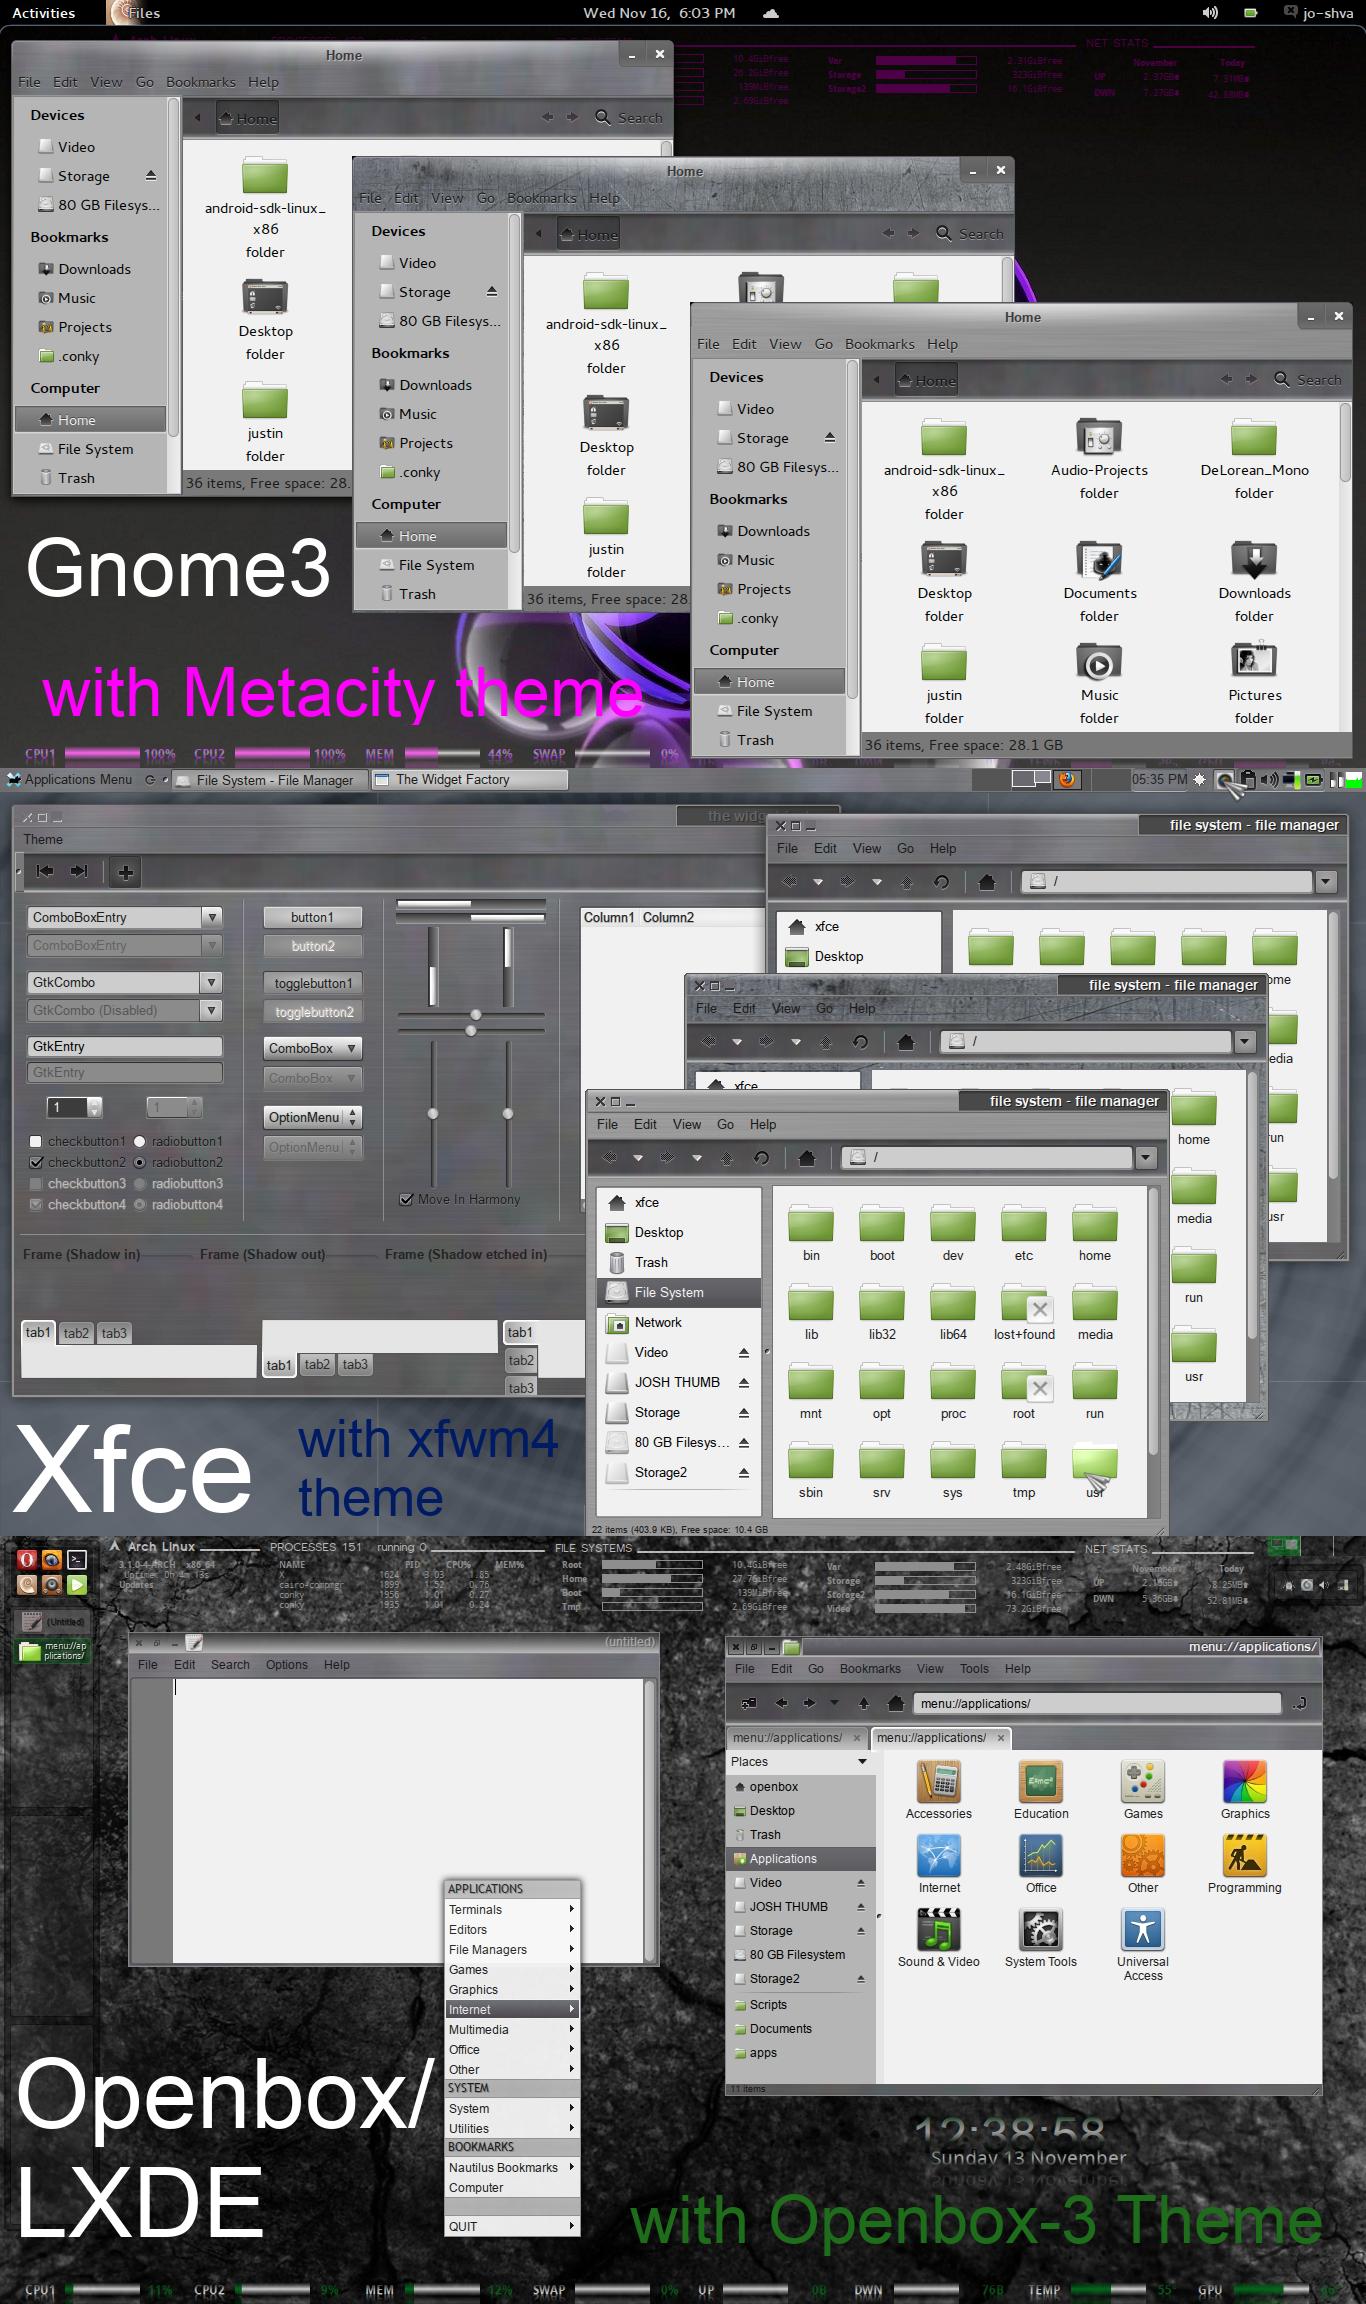 DeLorean_Mono Gtk3 Themes 1.5.2